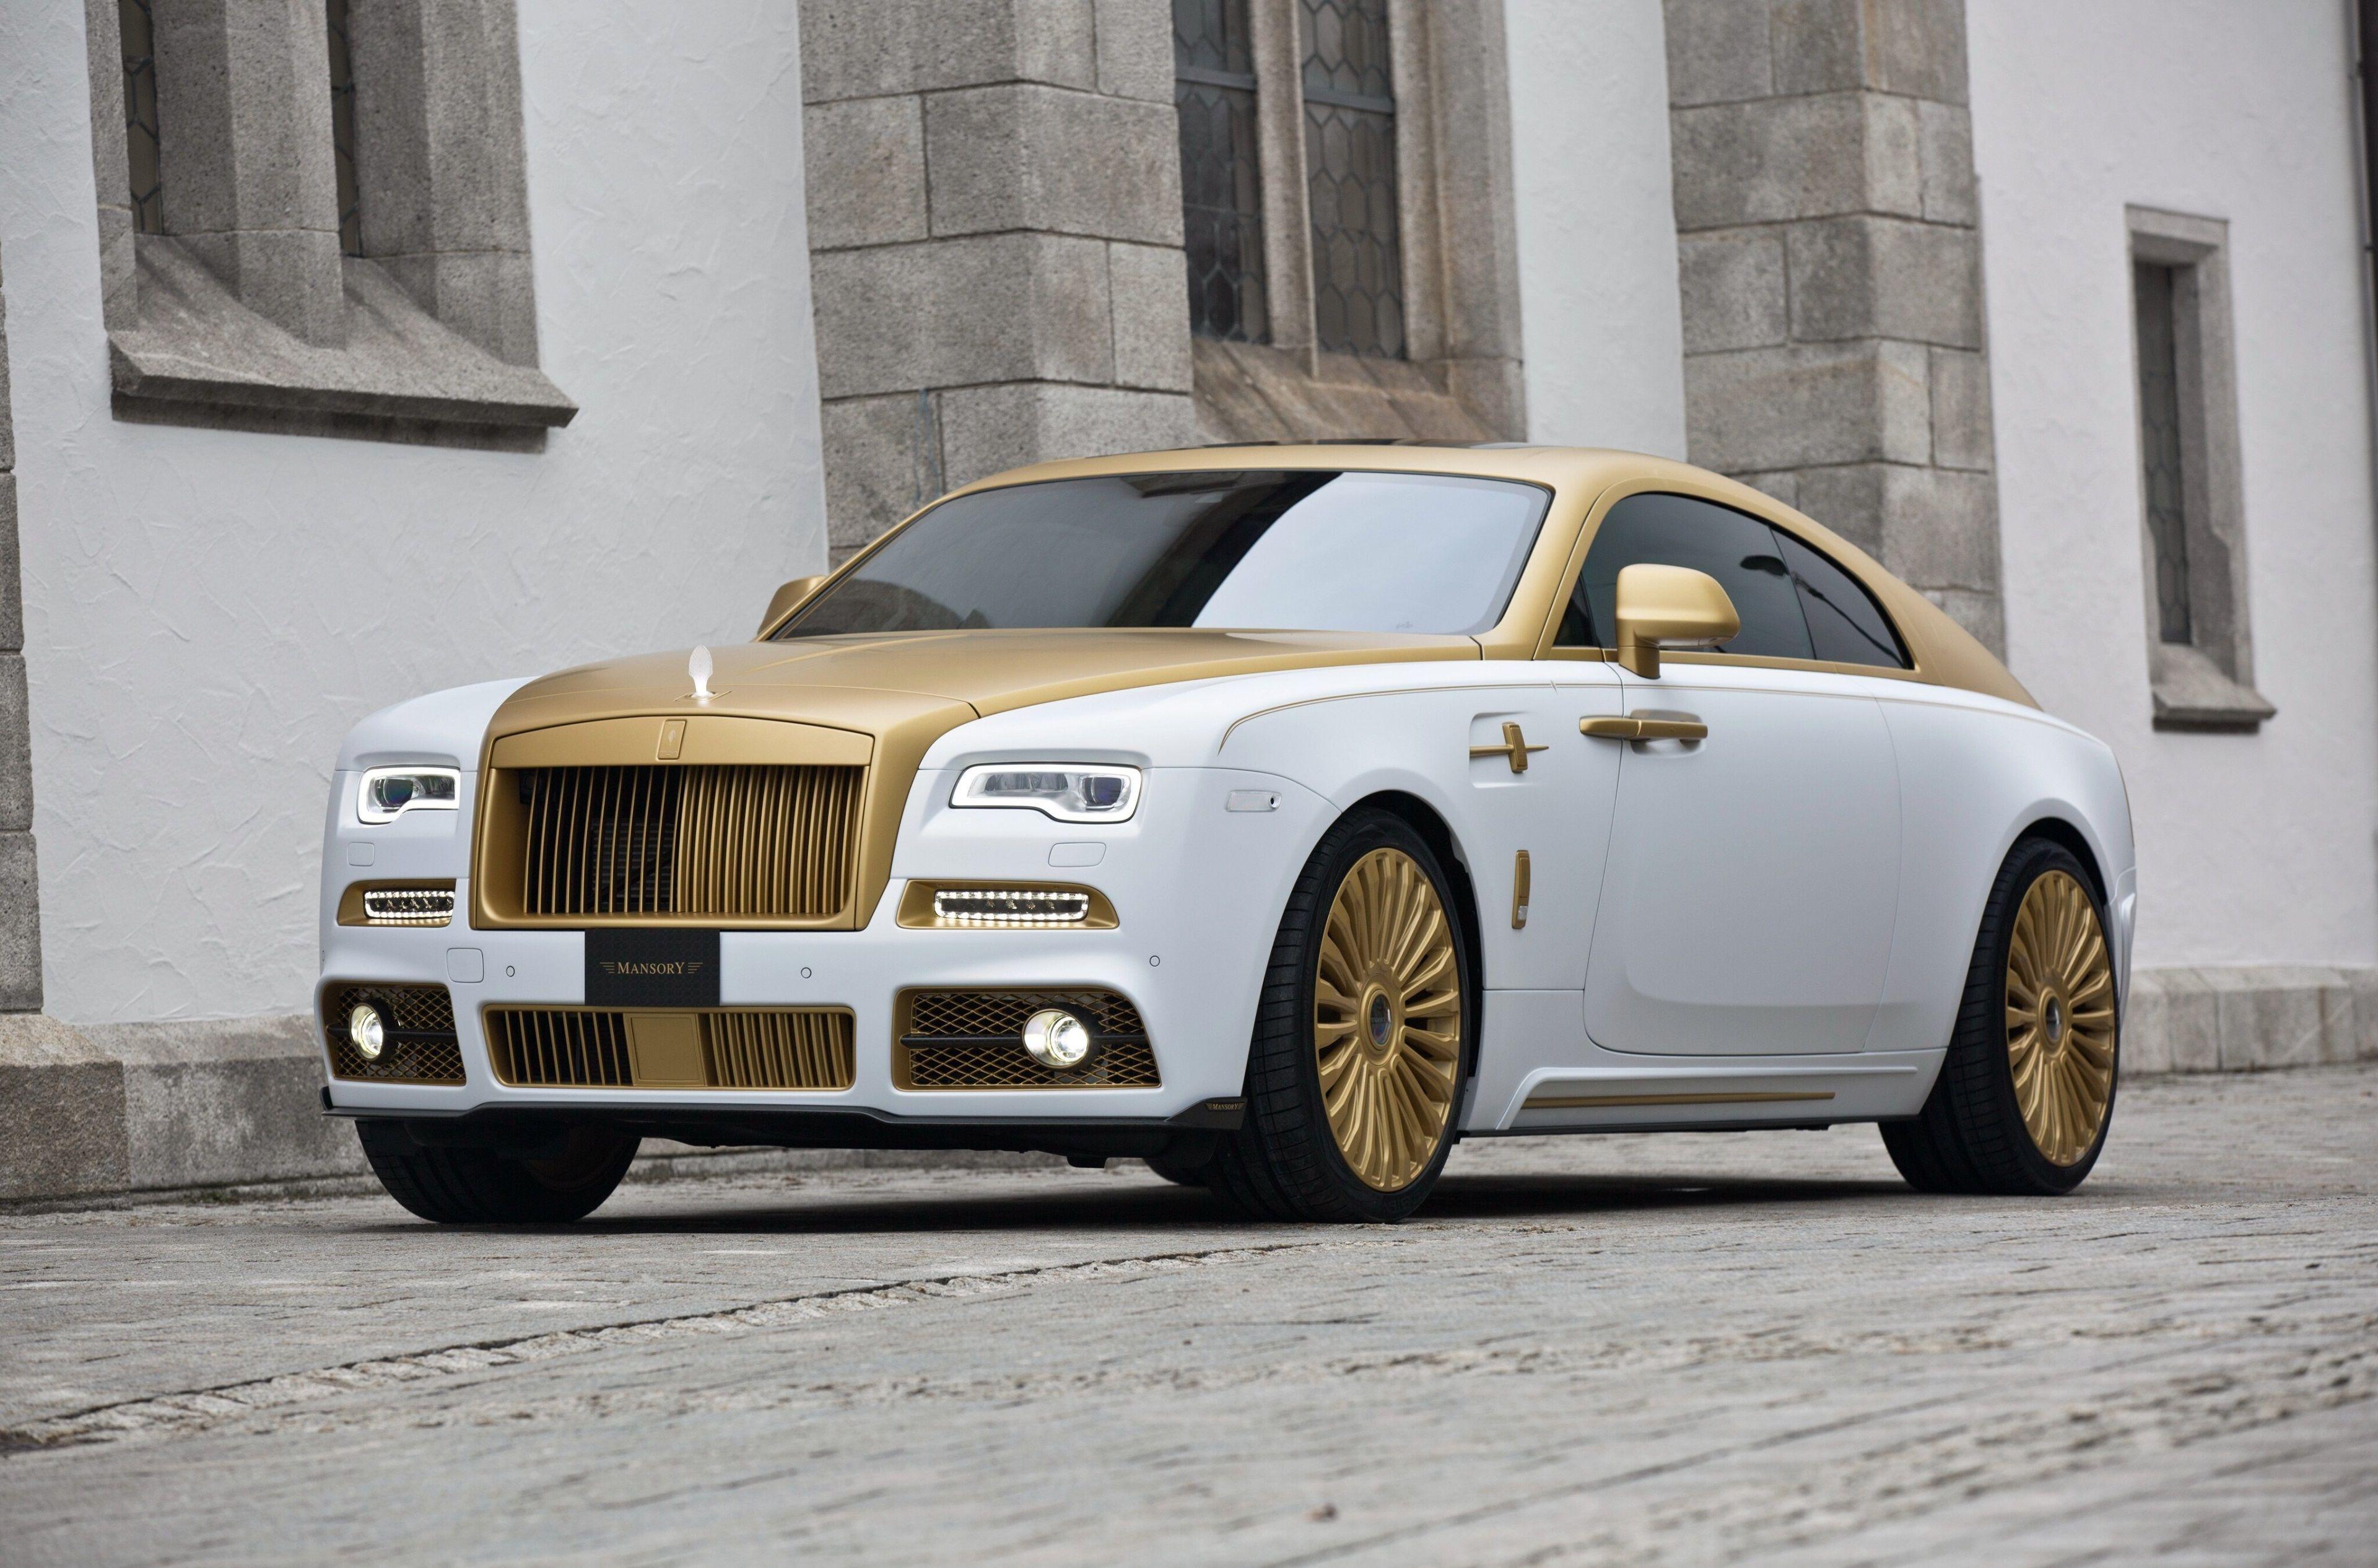 3840x2532 Mansory Rolls Royce Wraith 4k Hd Wallpaper Free Download Auto Auto S